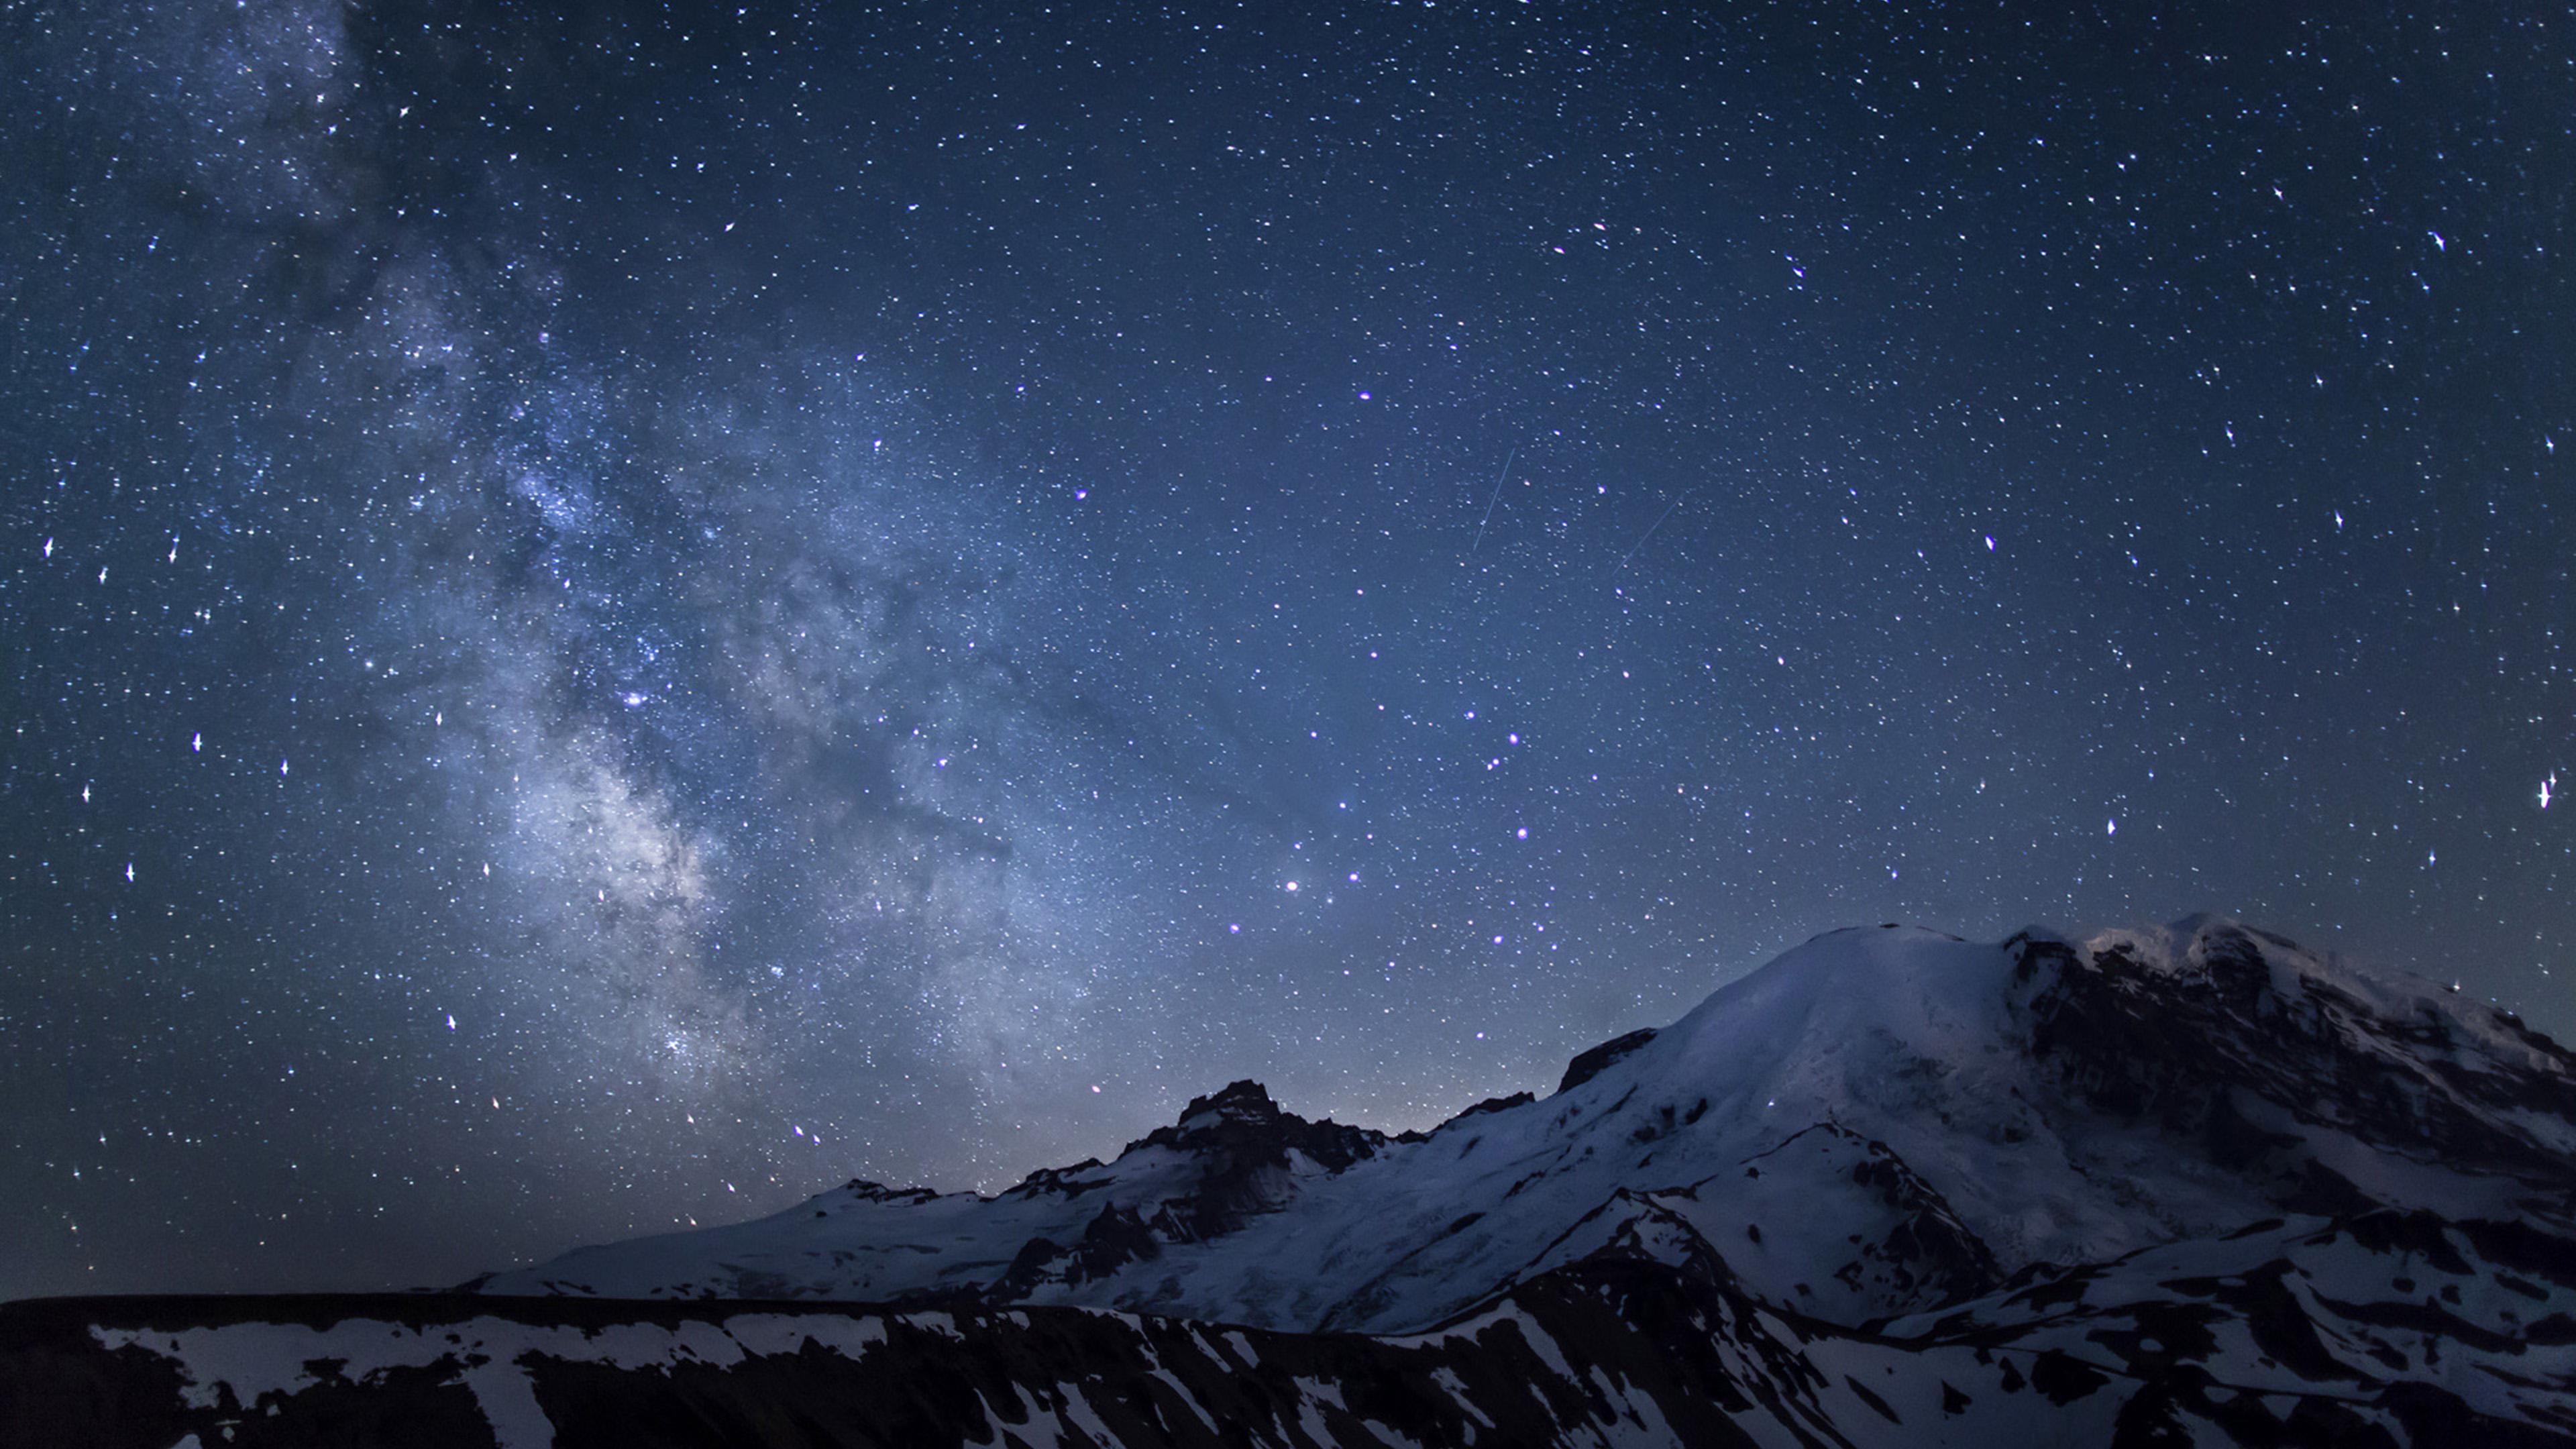 Beautiful Space View 4k Hd Desktop Wallpaper For 4k Ultra: Lightning Storm